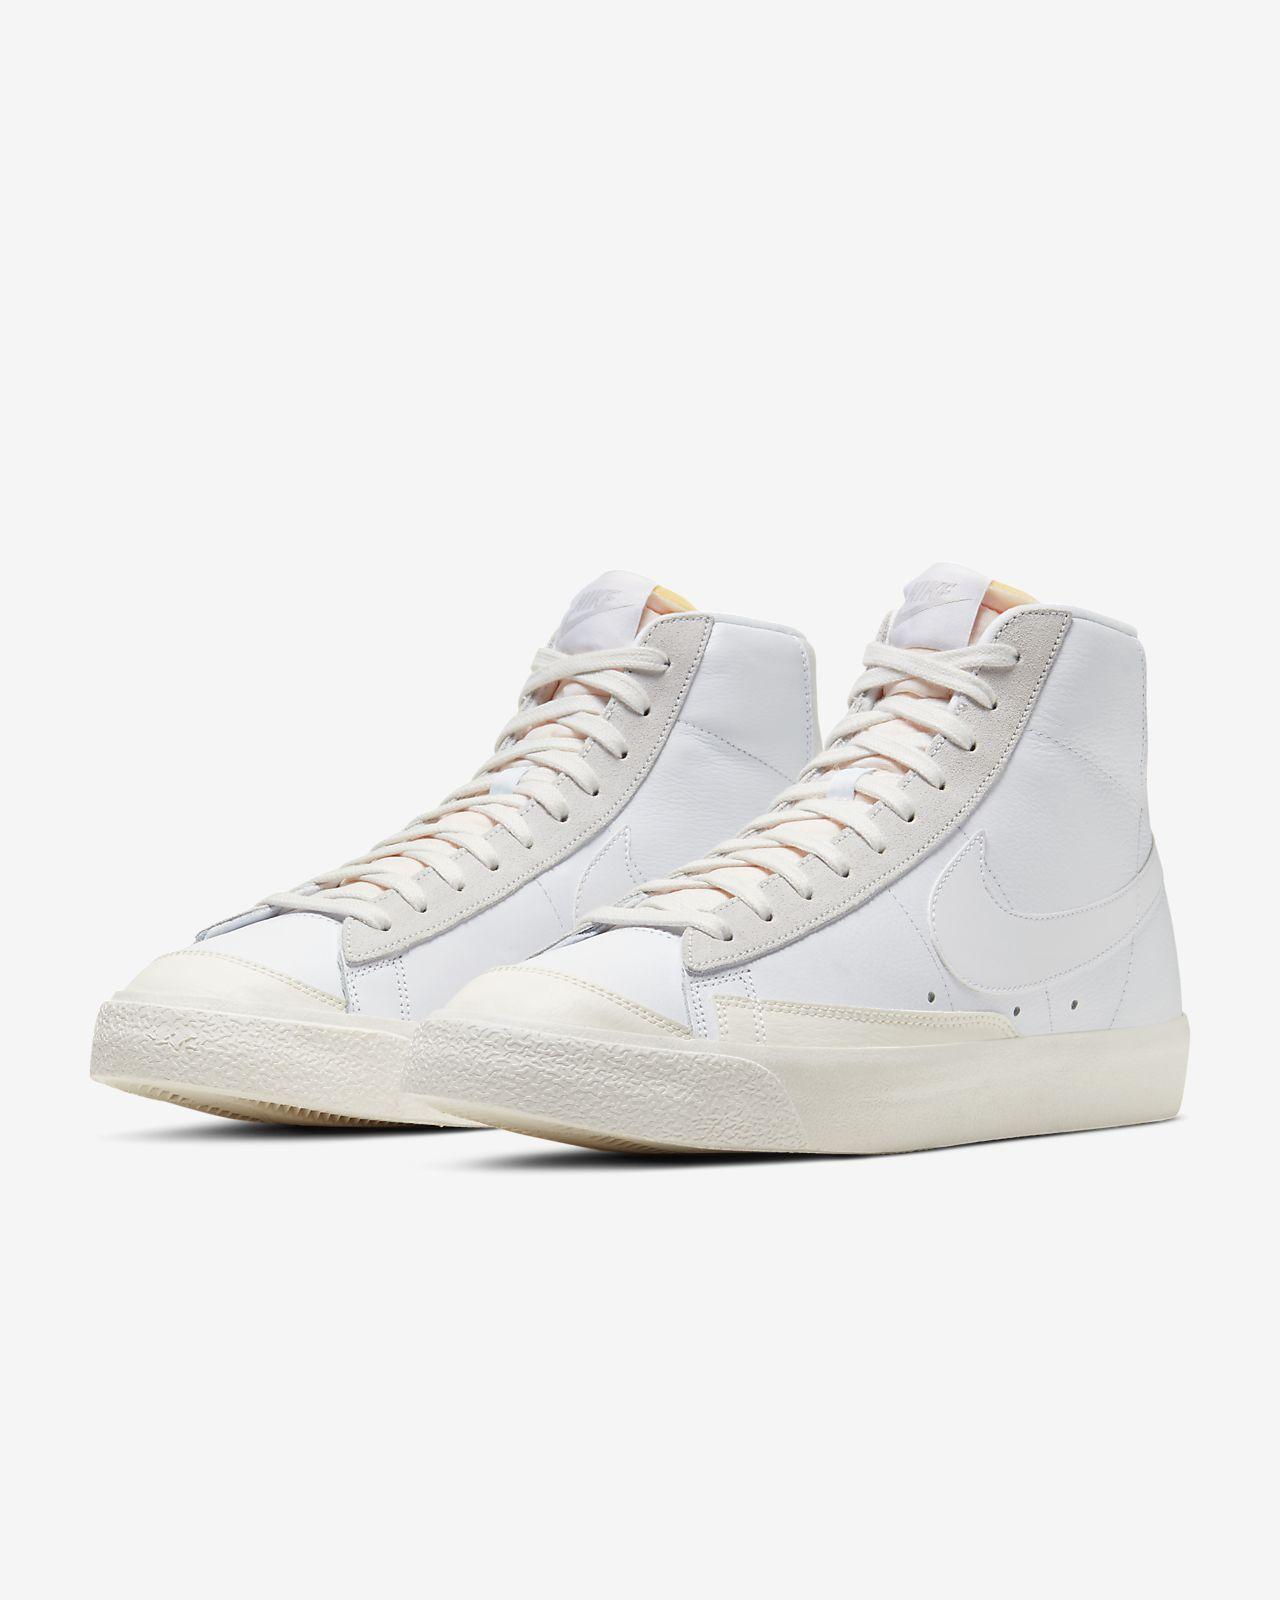 Nike Blazer Mid '77 Vintage Men's Shoe CW7583-100